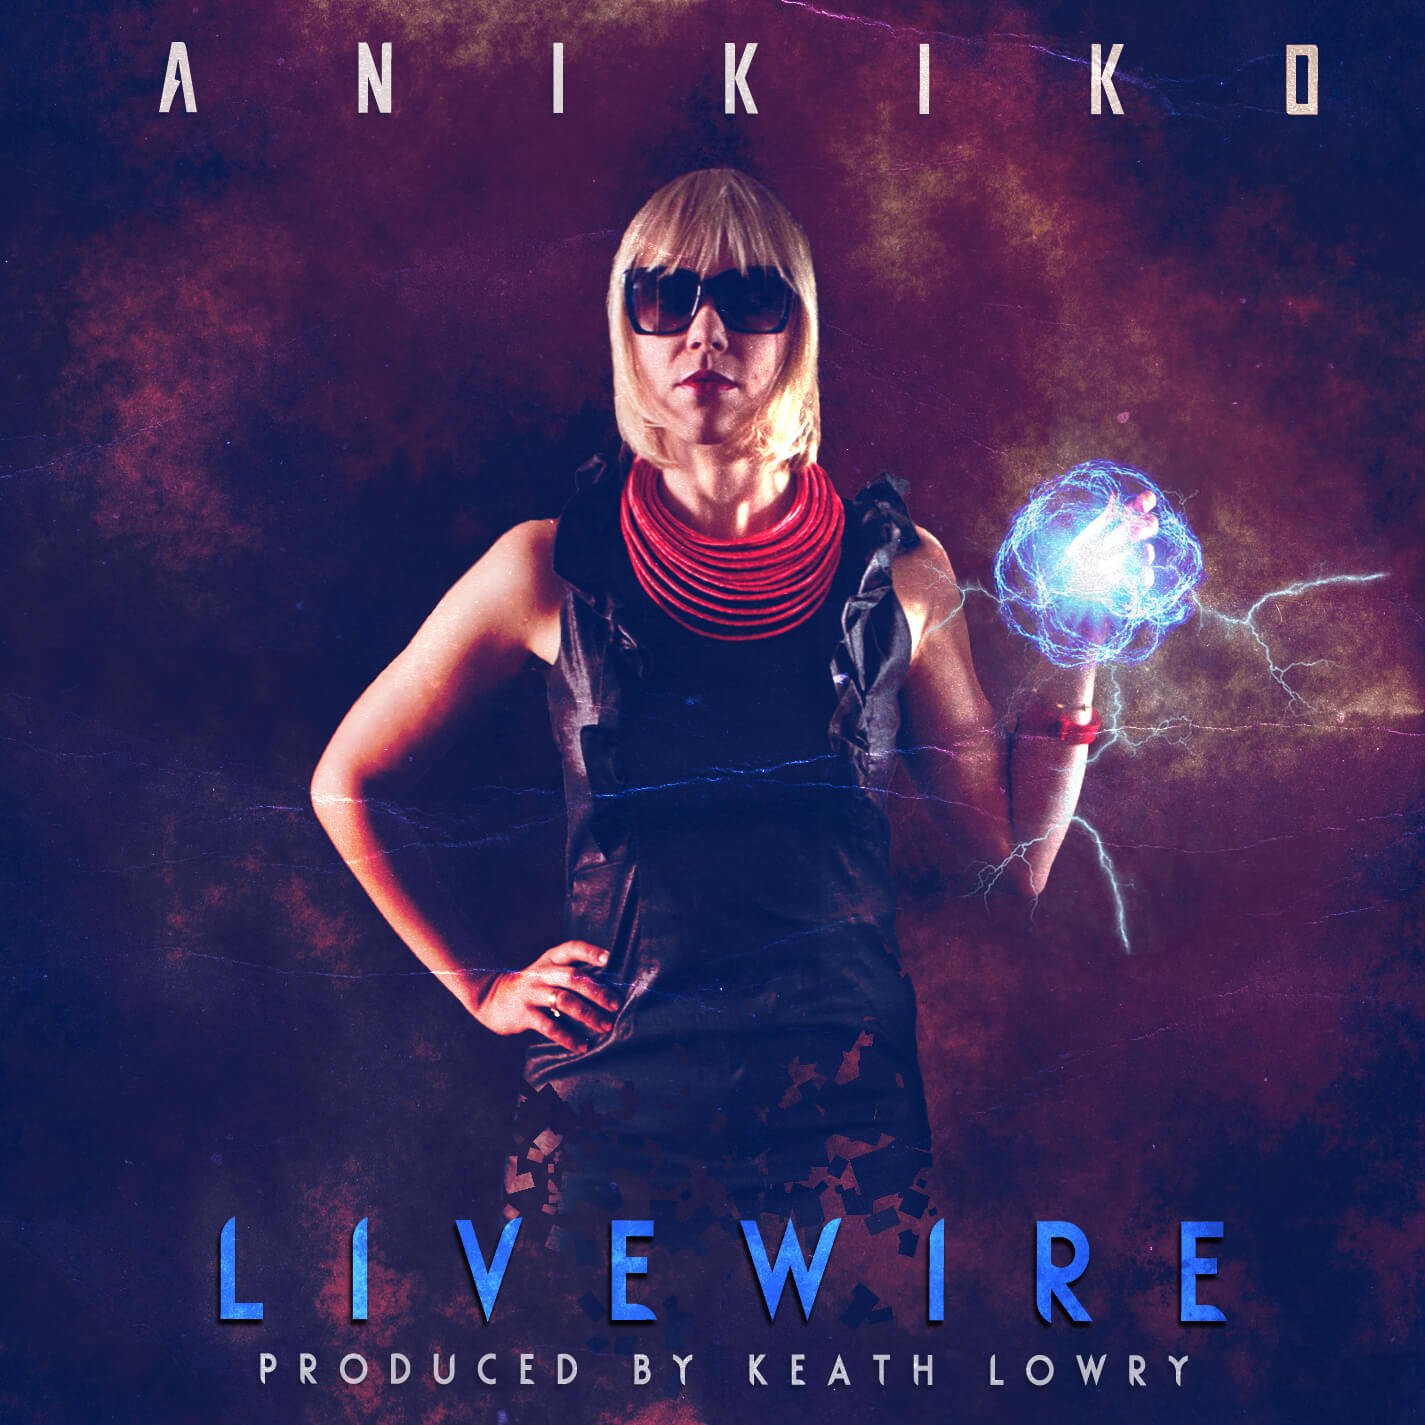 anikiko livewire song